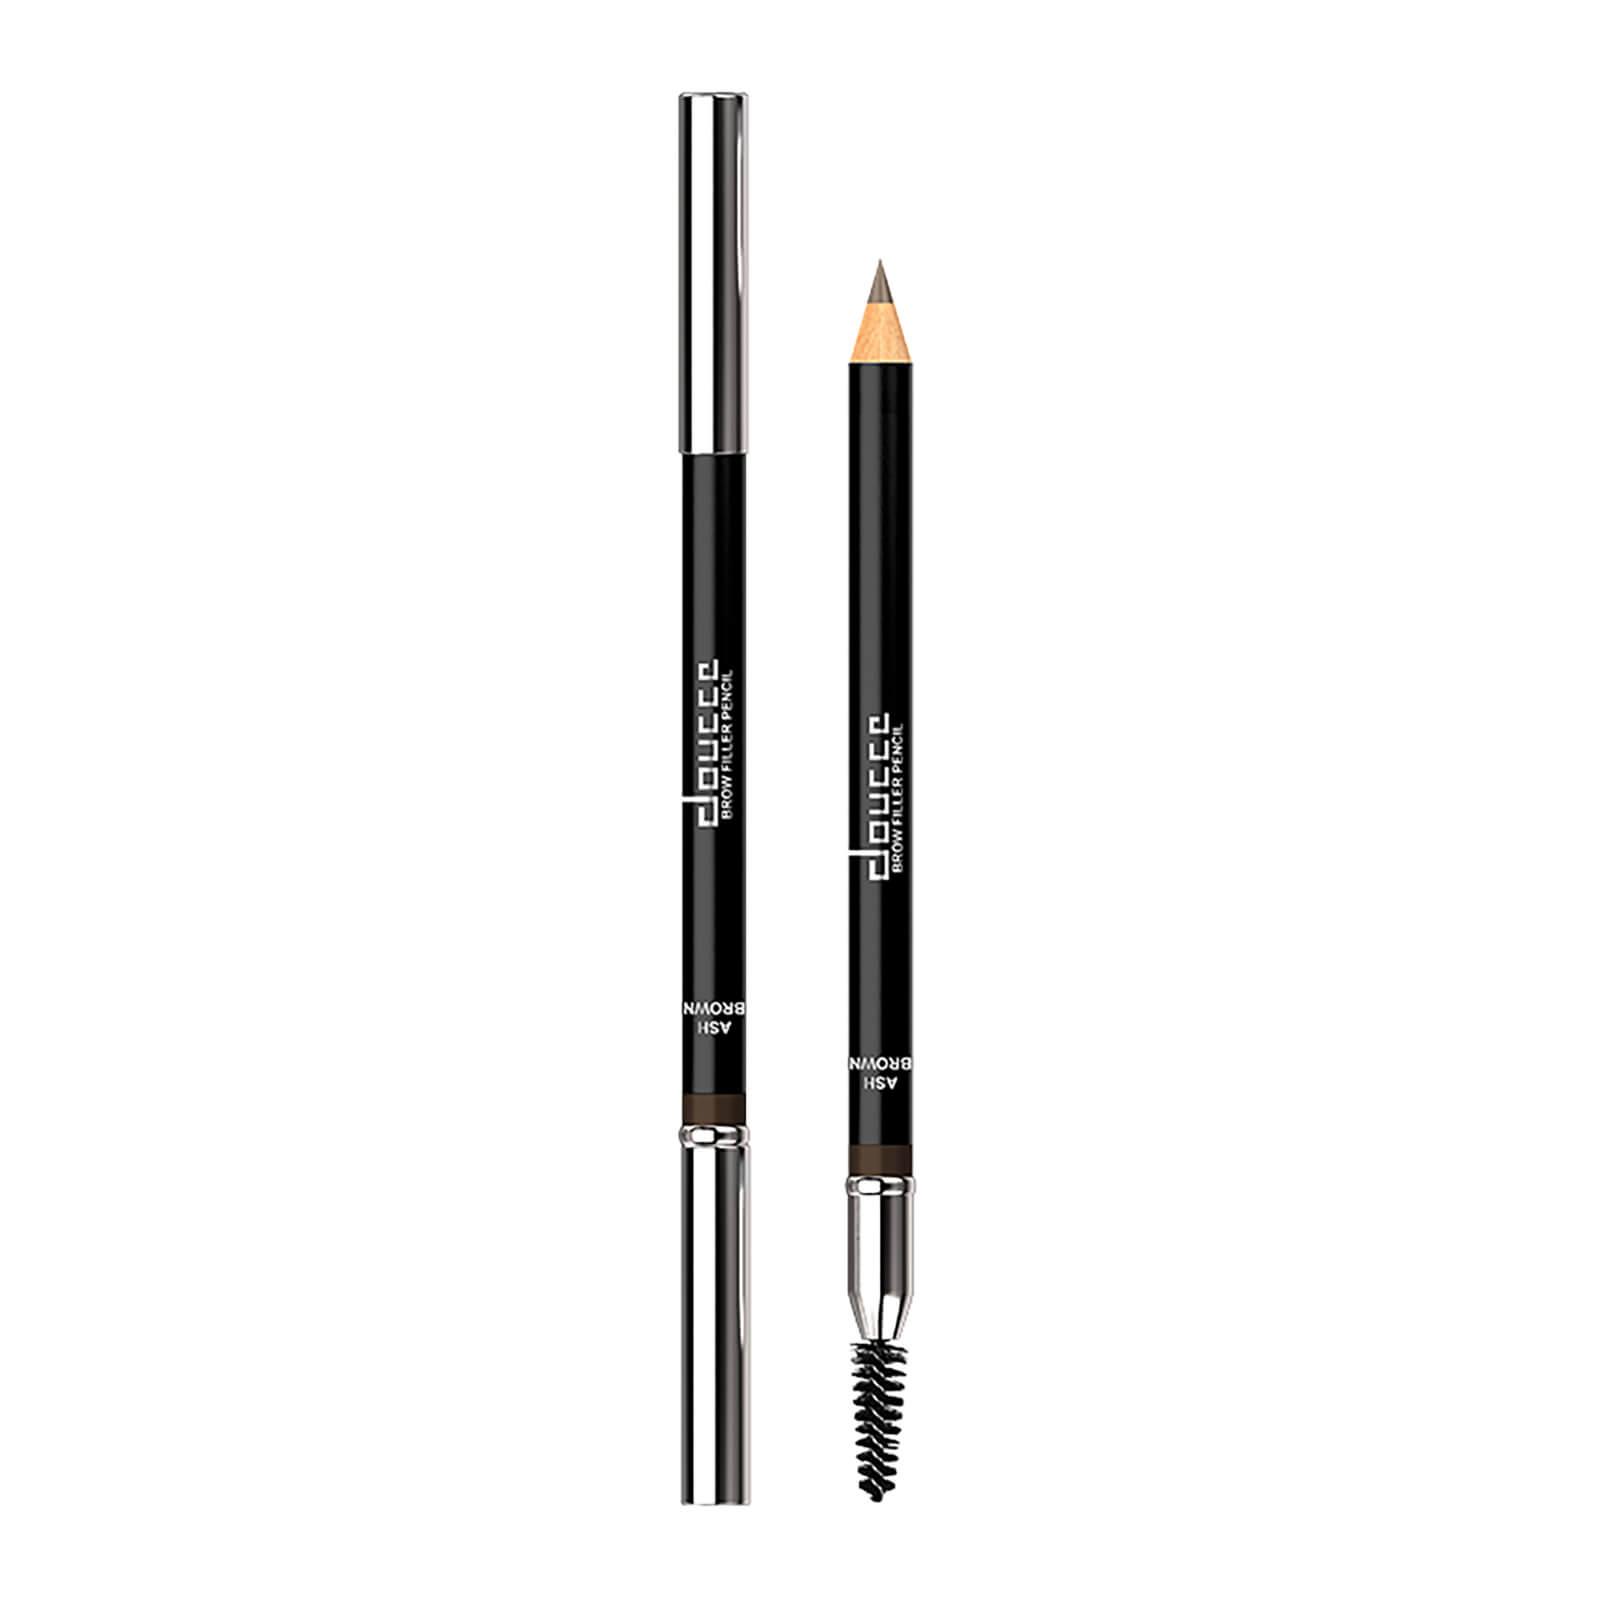 doucce Brow Filler matita per sopracciglia - 1,25 g (varie tonalità) - Ash Brown (623)